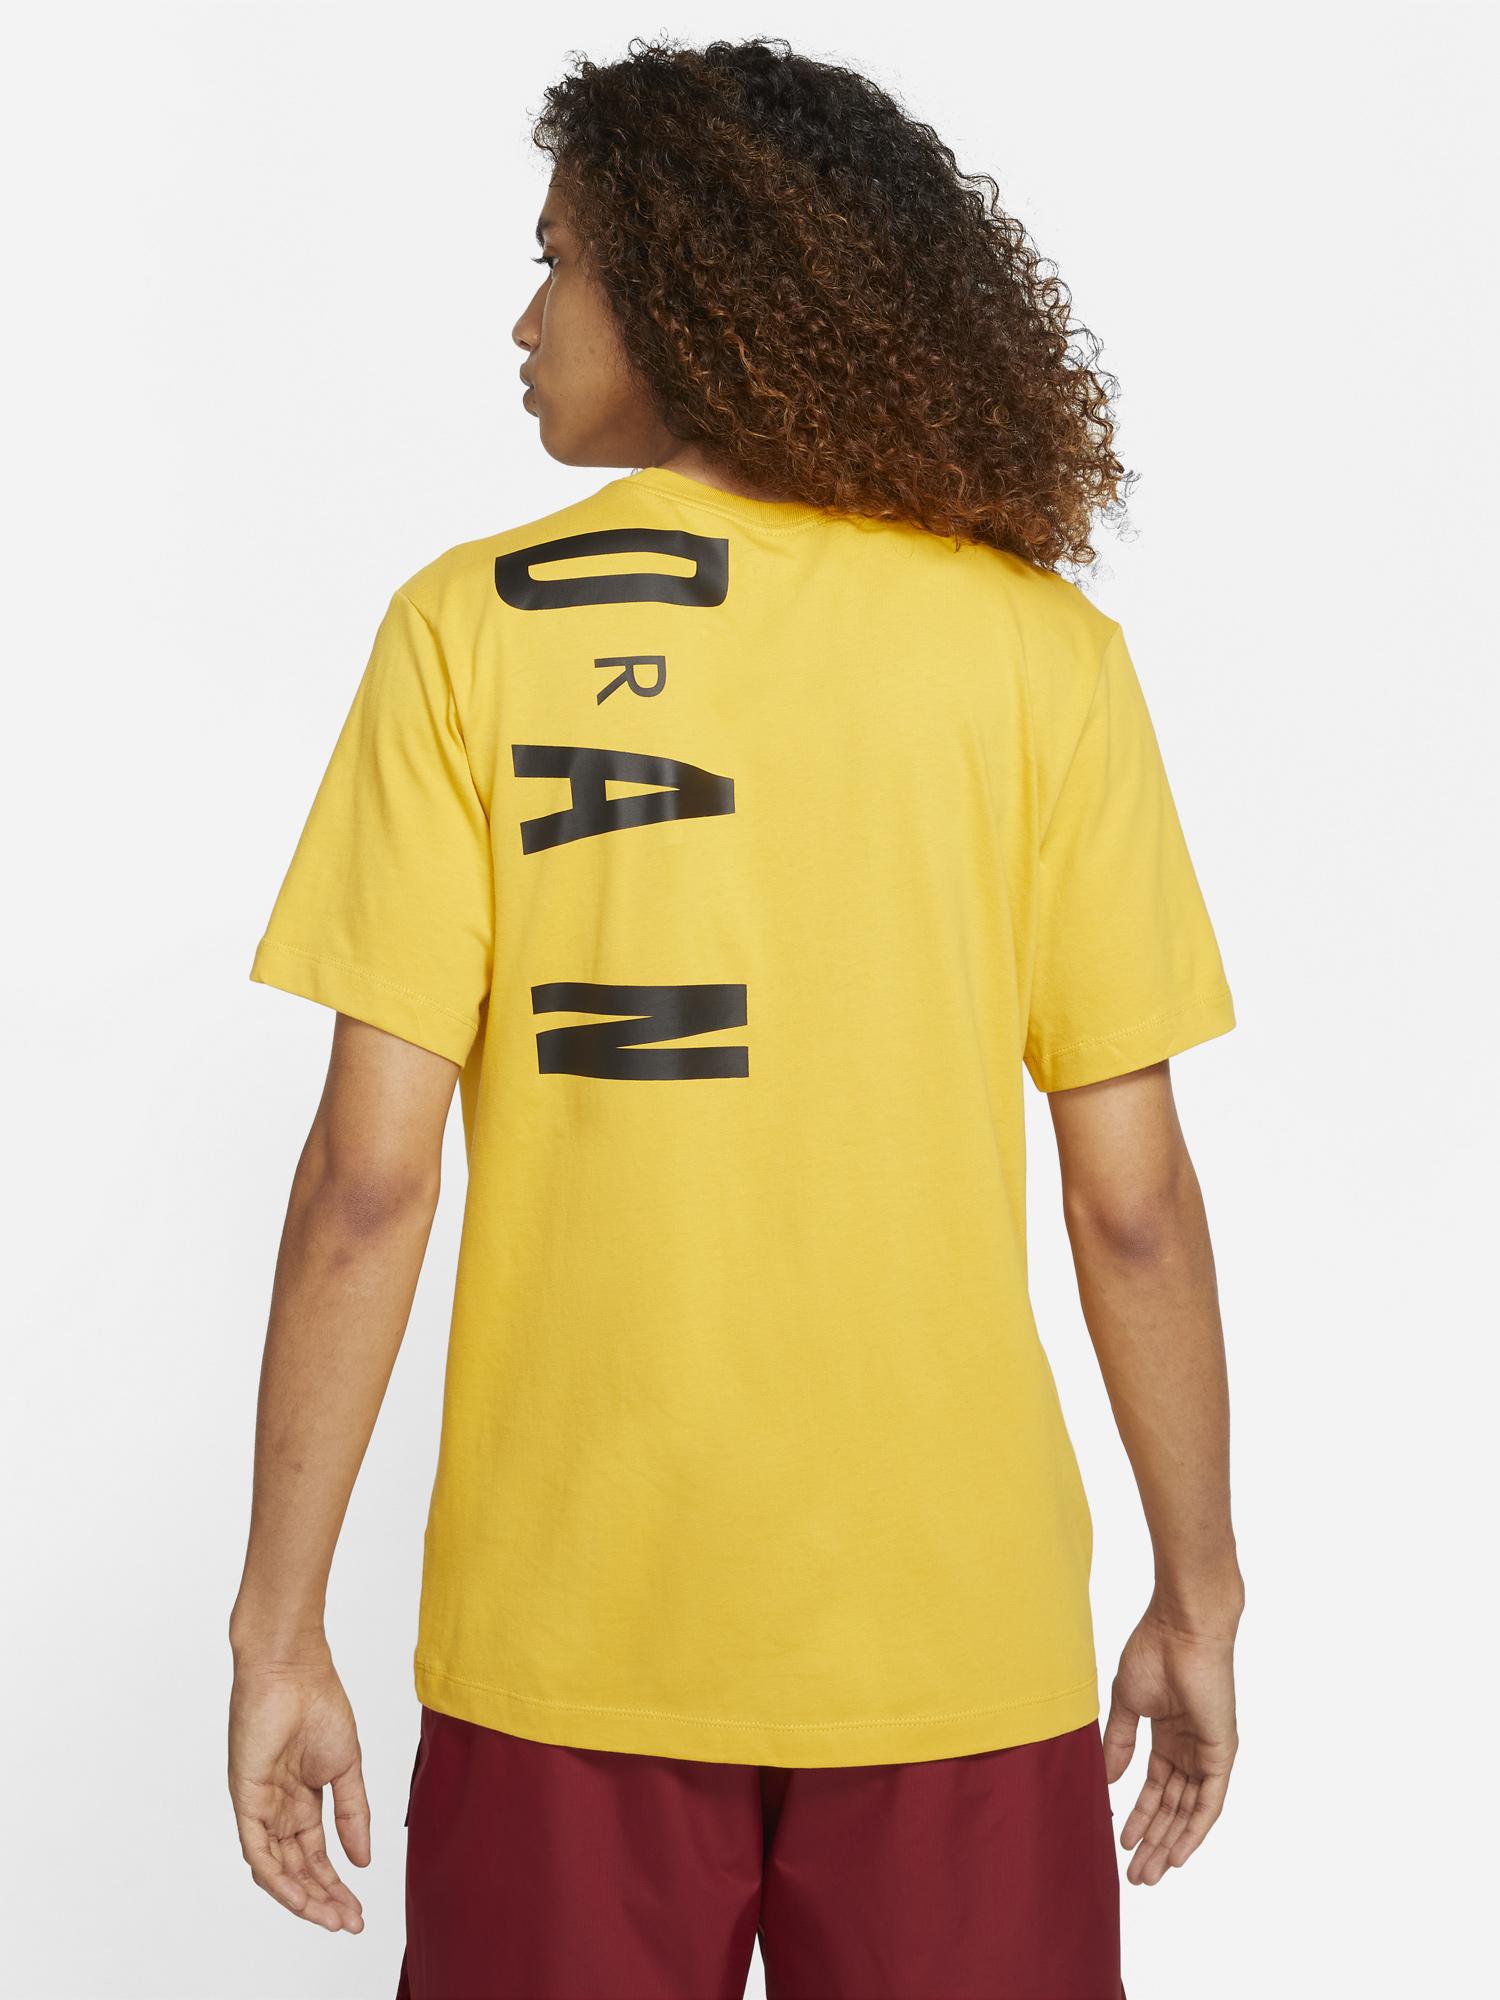 air-jordan-1-high-og-pollen-shirt-2